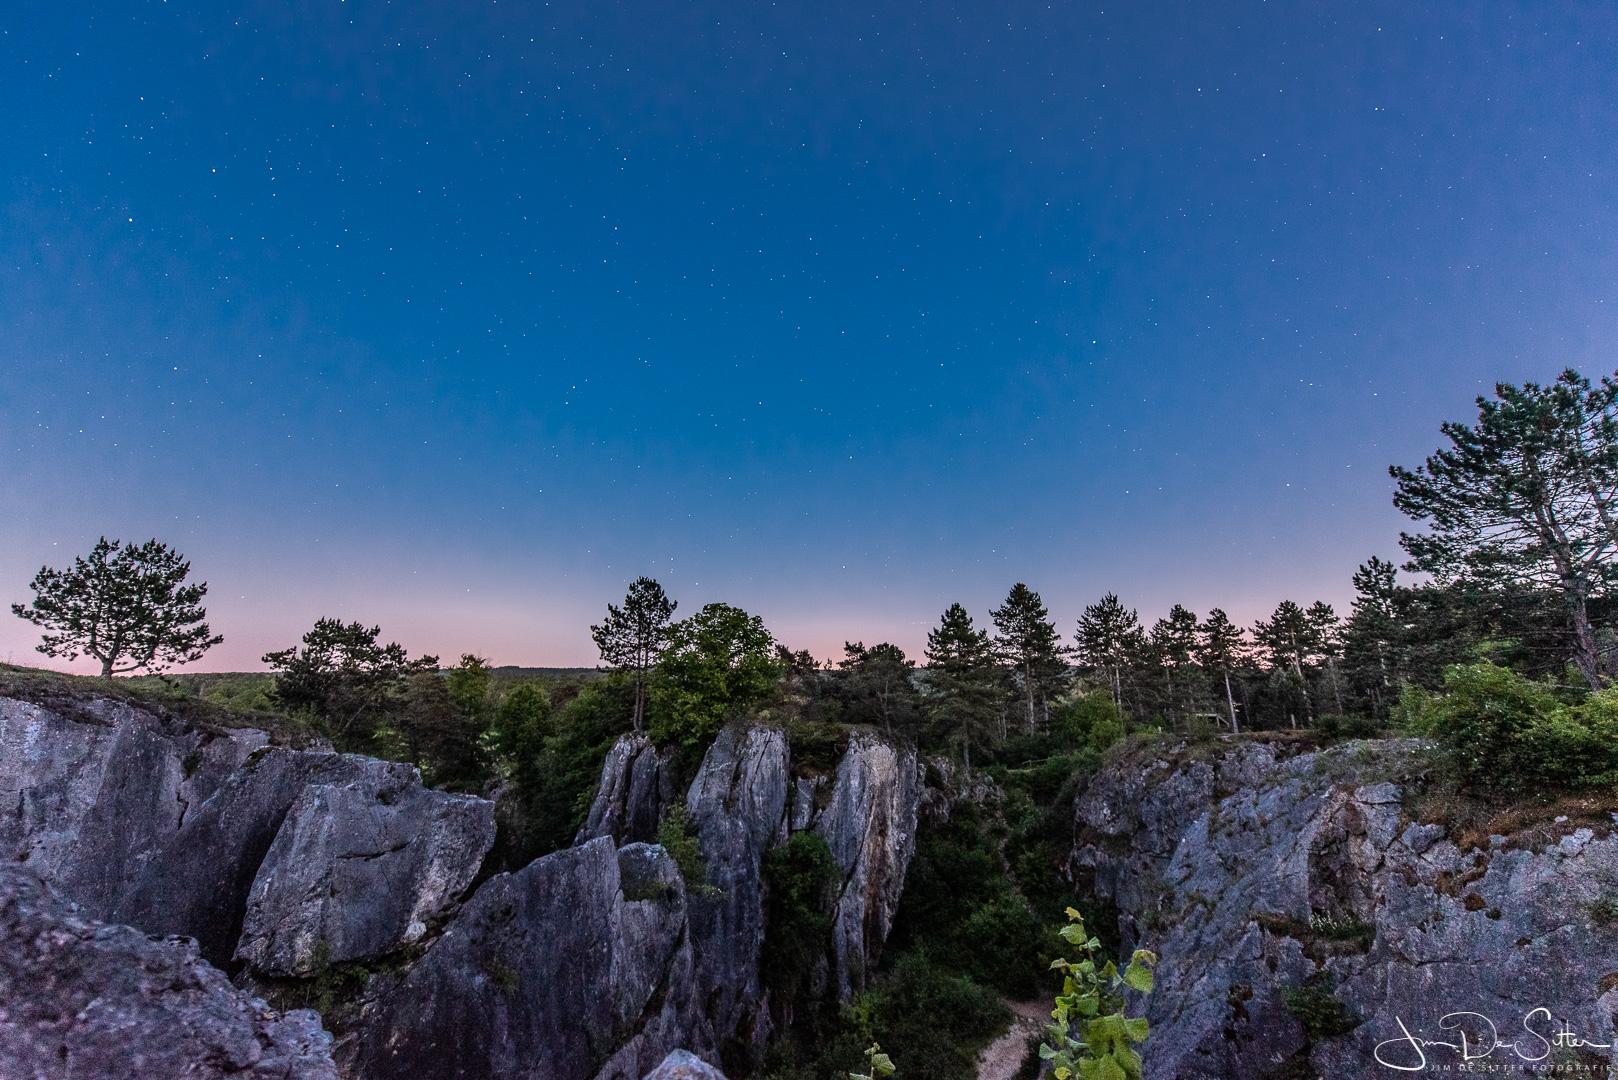 Landschapsfoto : de avond valt over Foundry Des Chiens